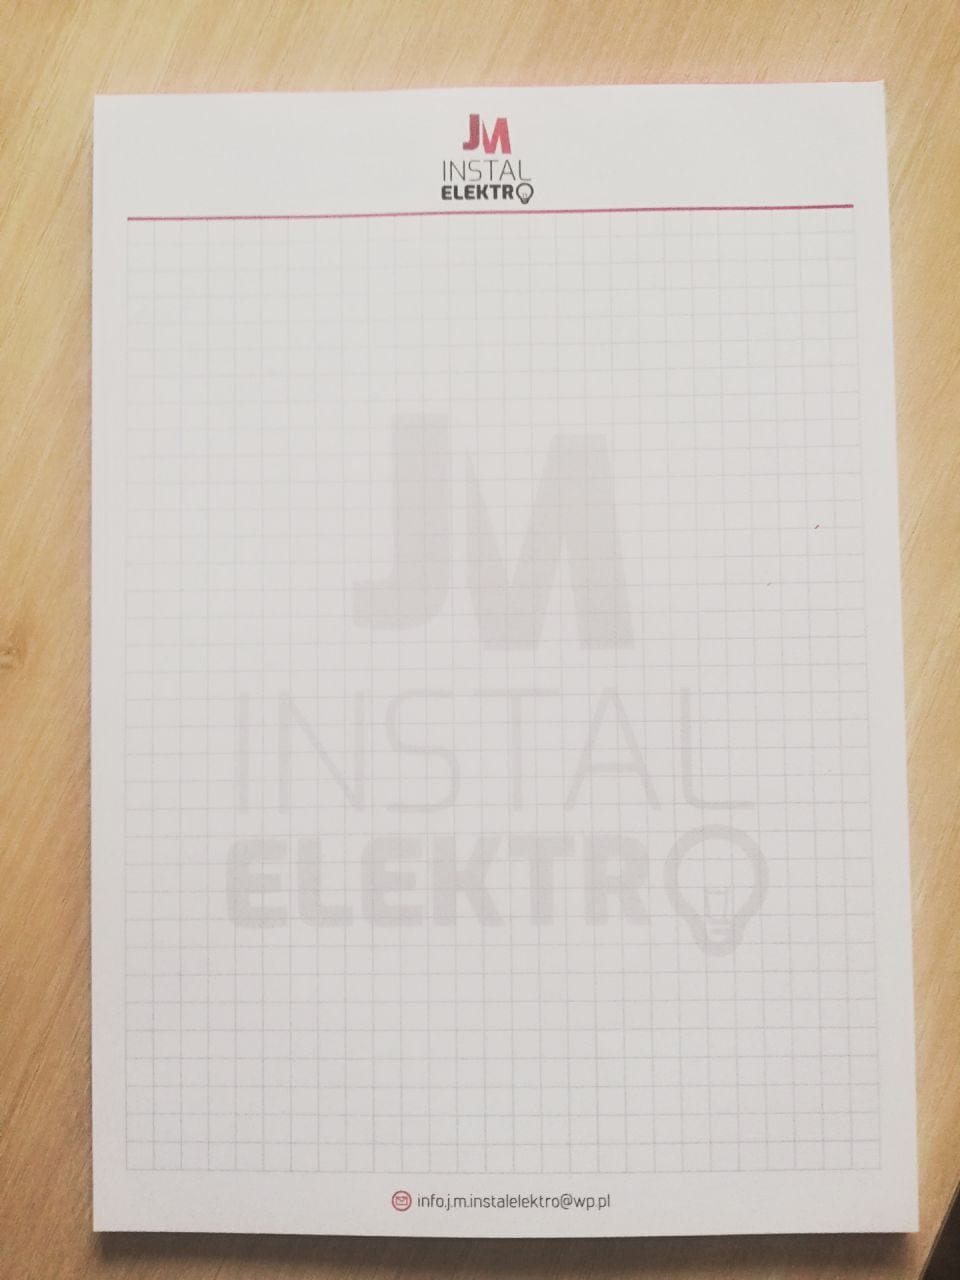 notesy z nadrukiem Instal Elektro